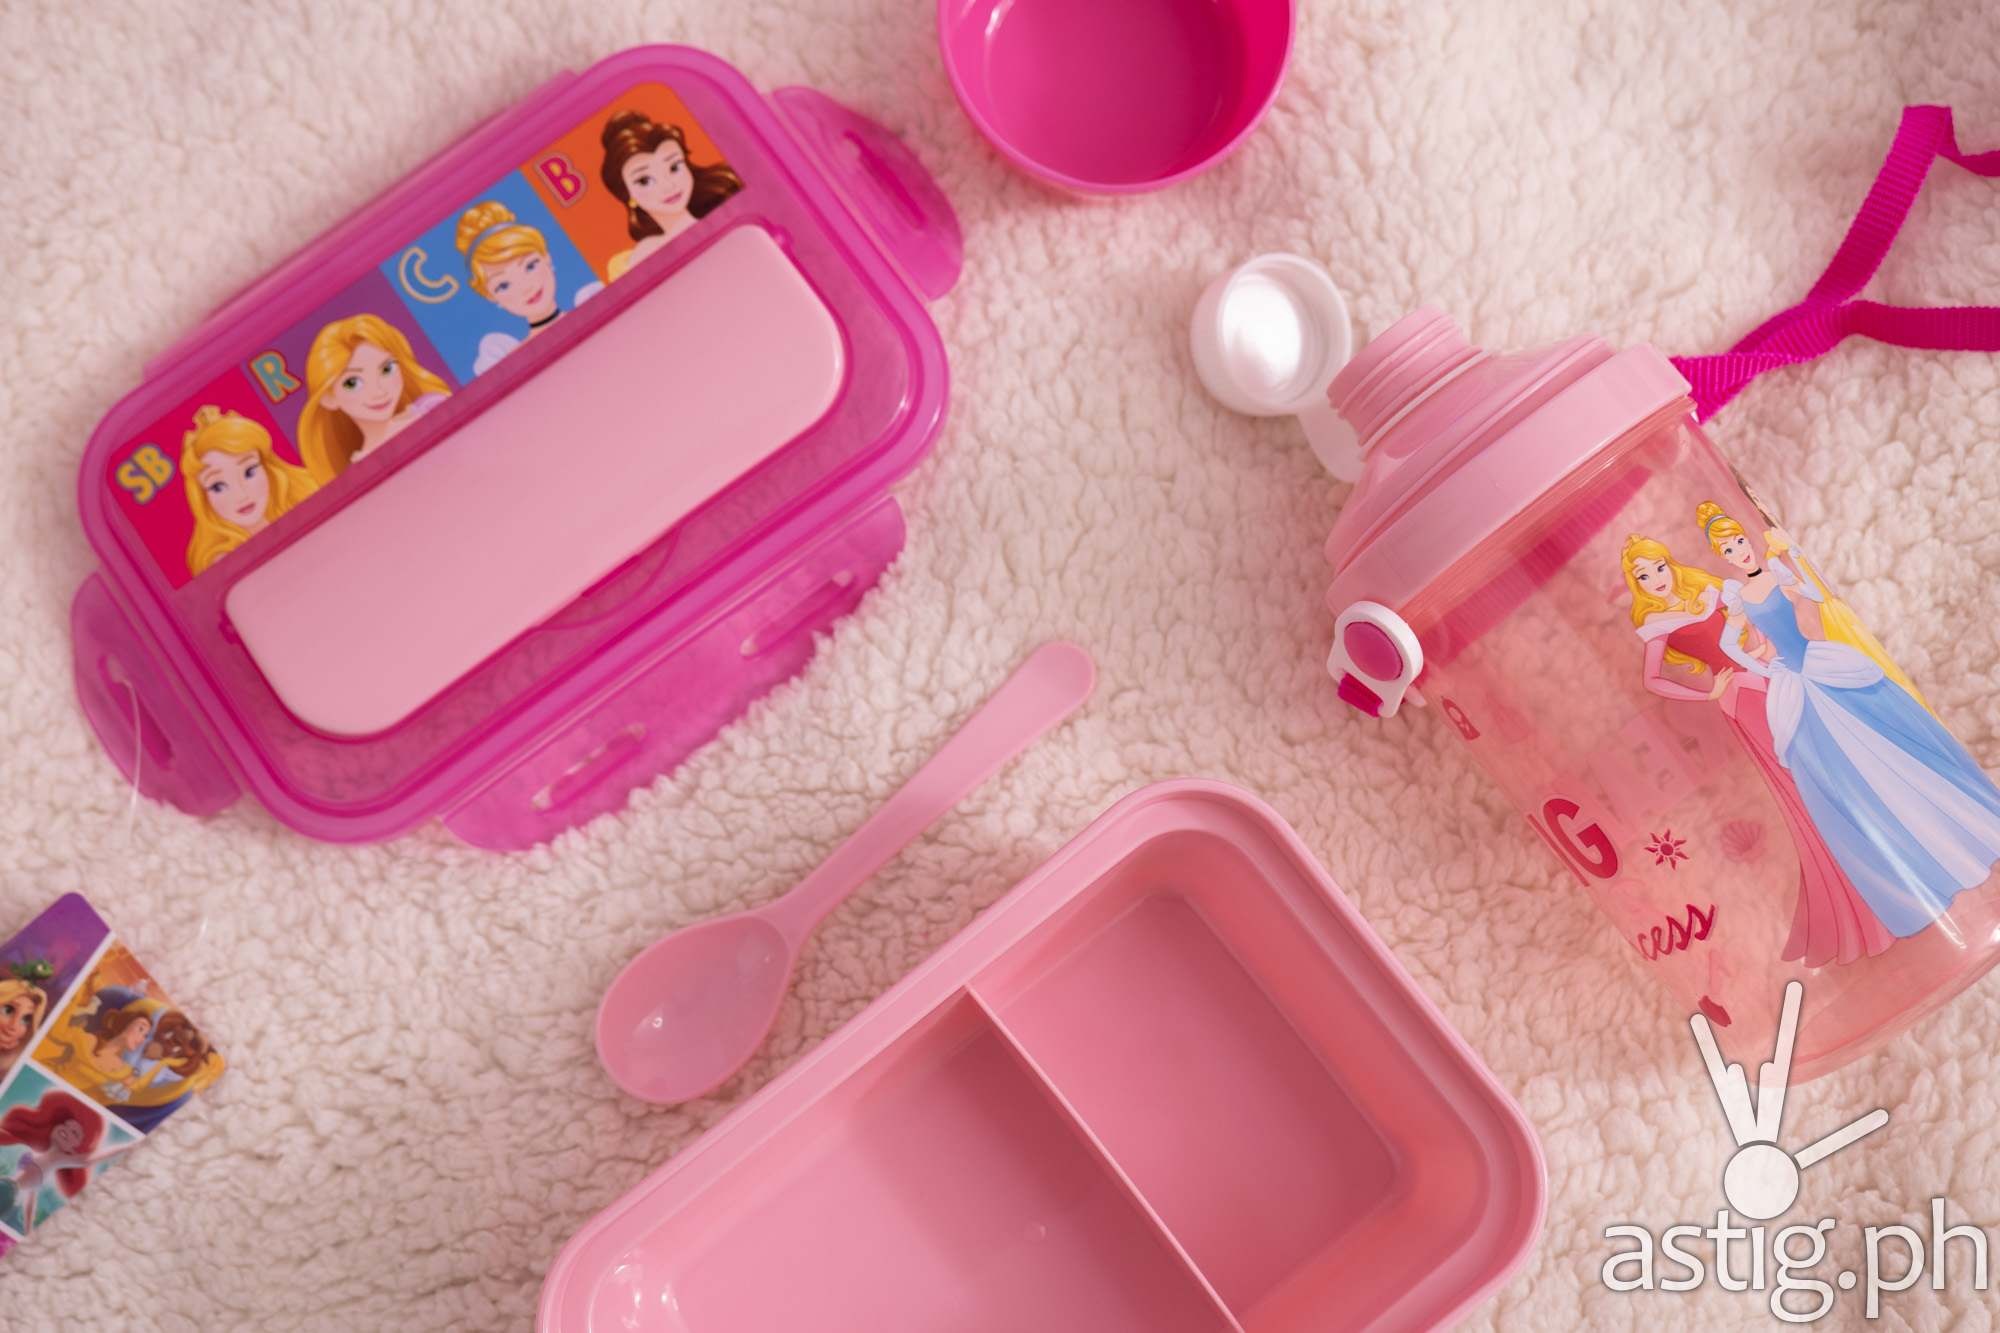 Disney Princess food keeper and water bottle set